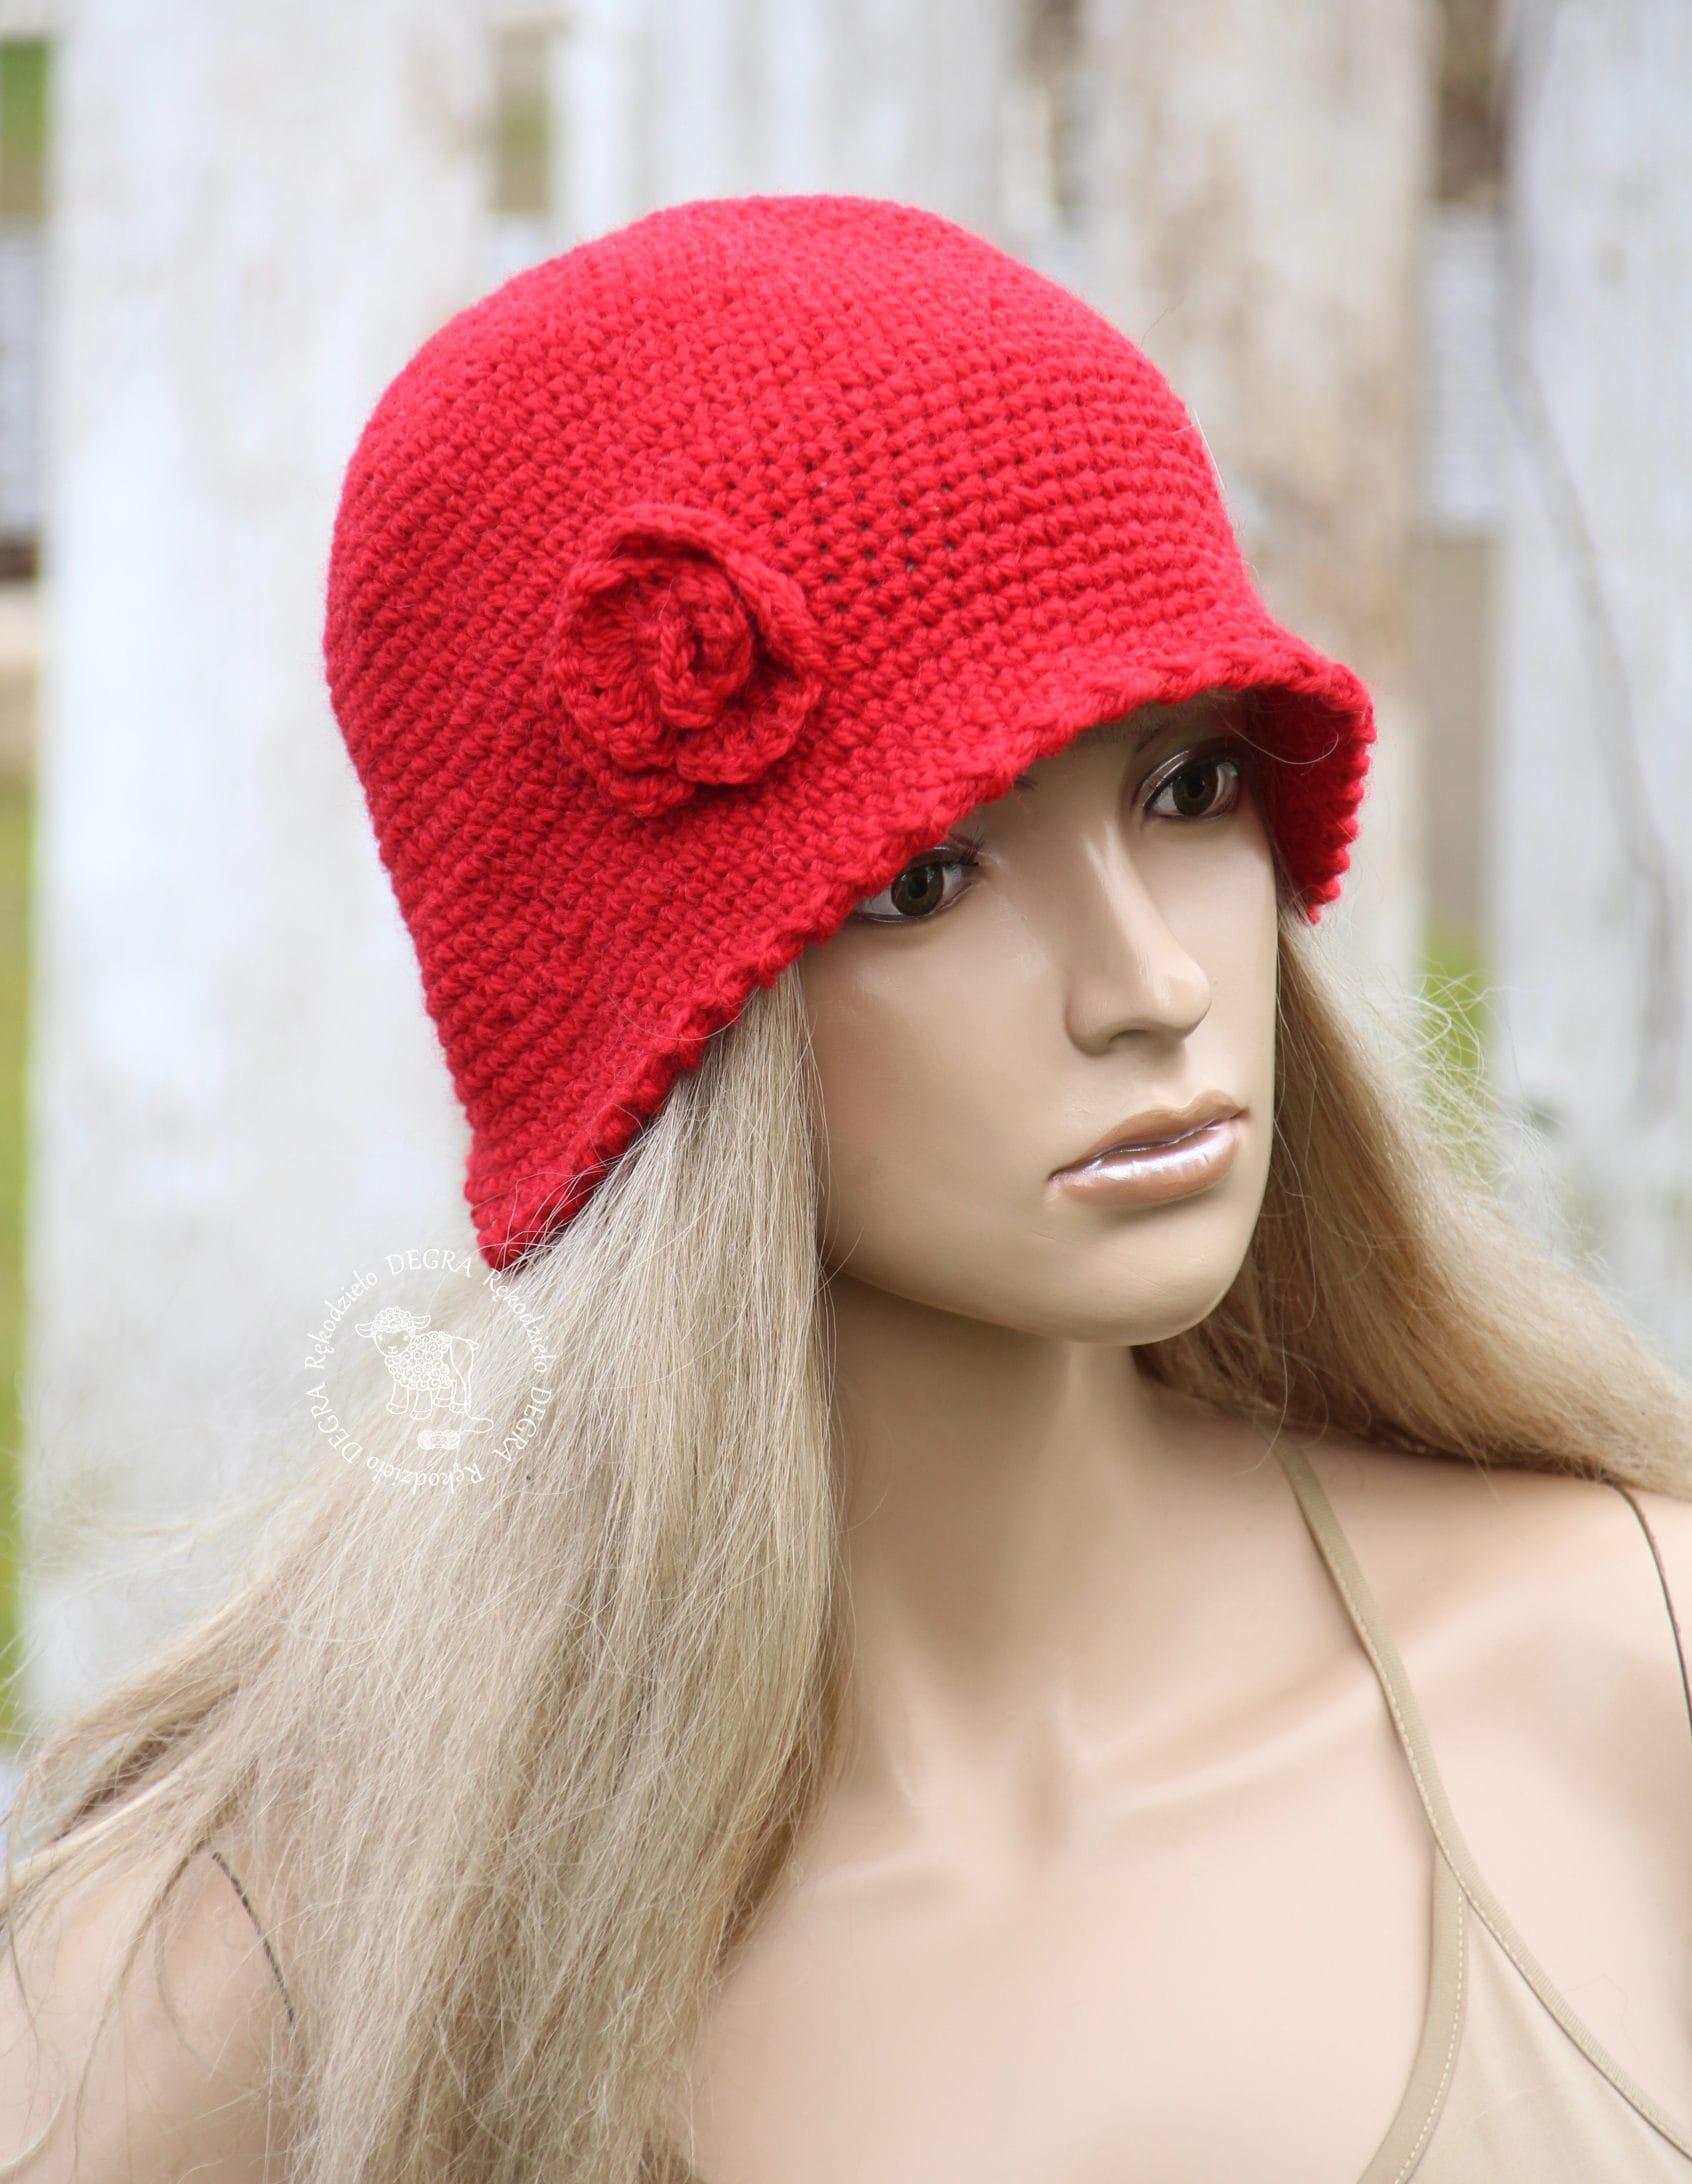 Red Winter Hat Fashion Cloche Winter Womens Hat Cloche -2141